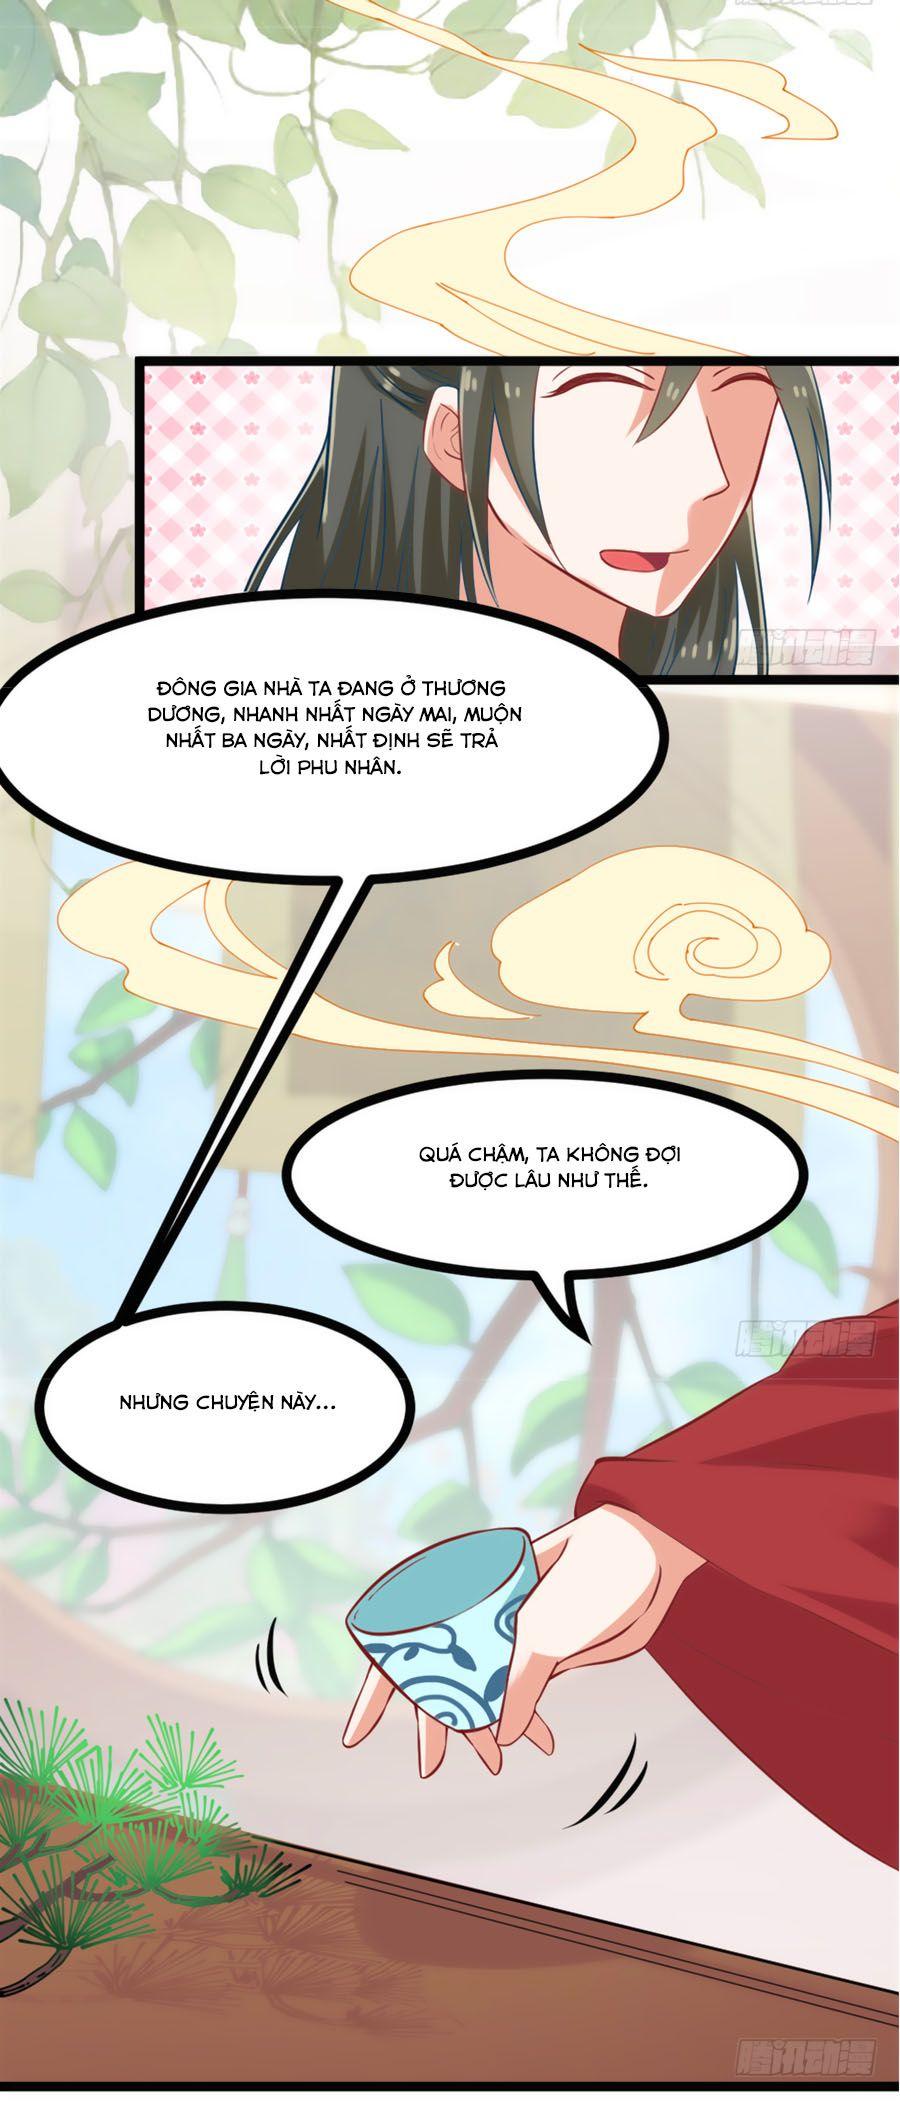 Ngọc Vi Mai chap 10 - Trang 29